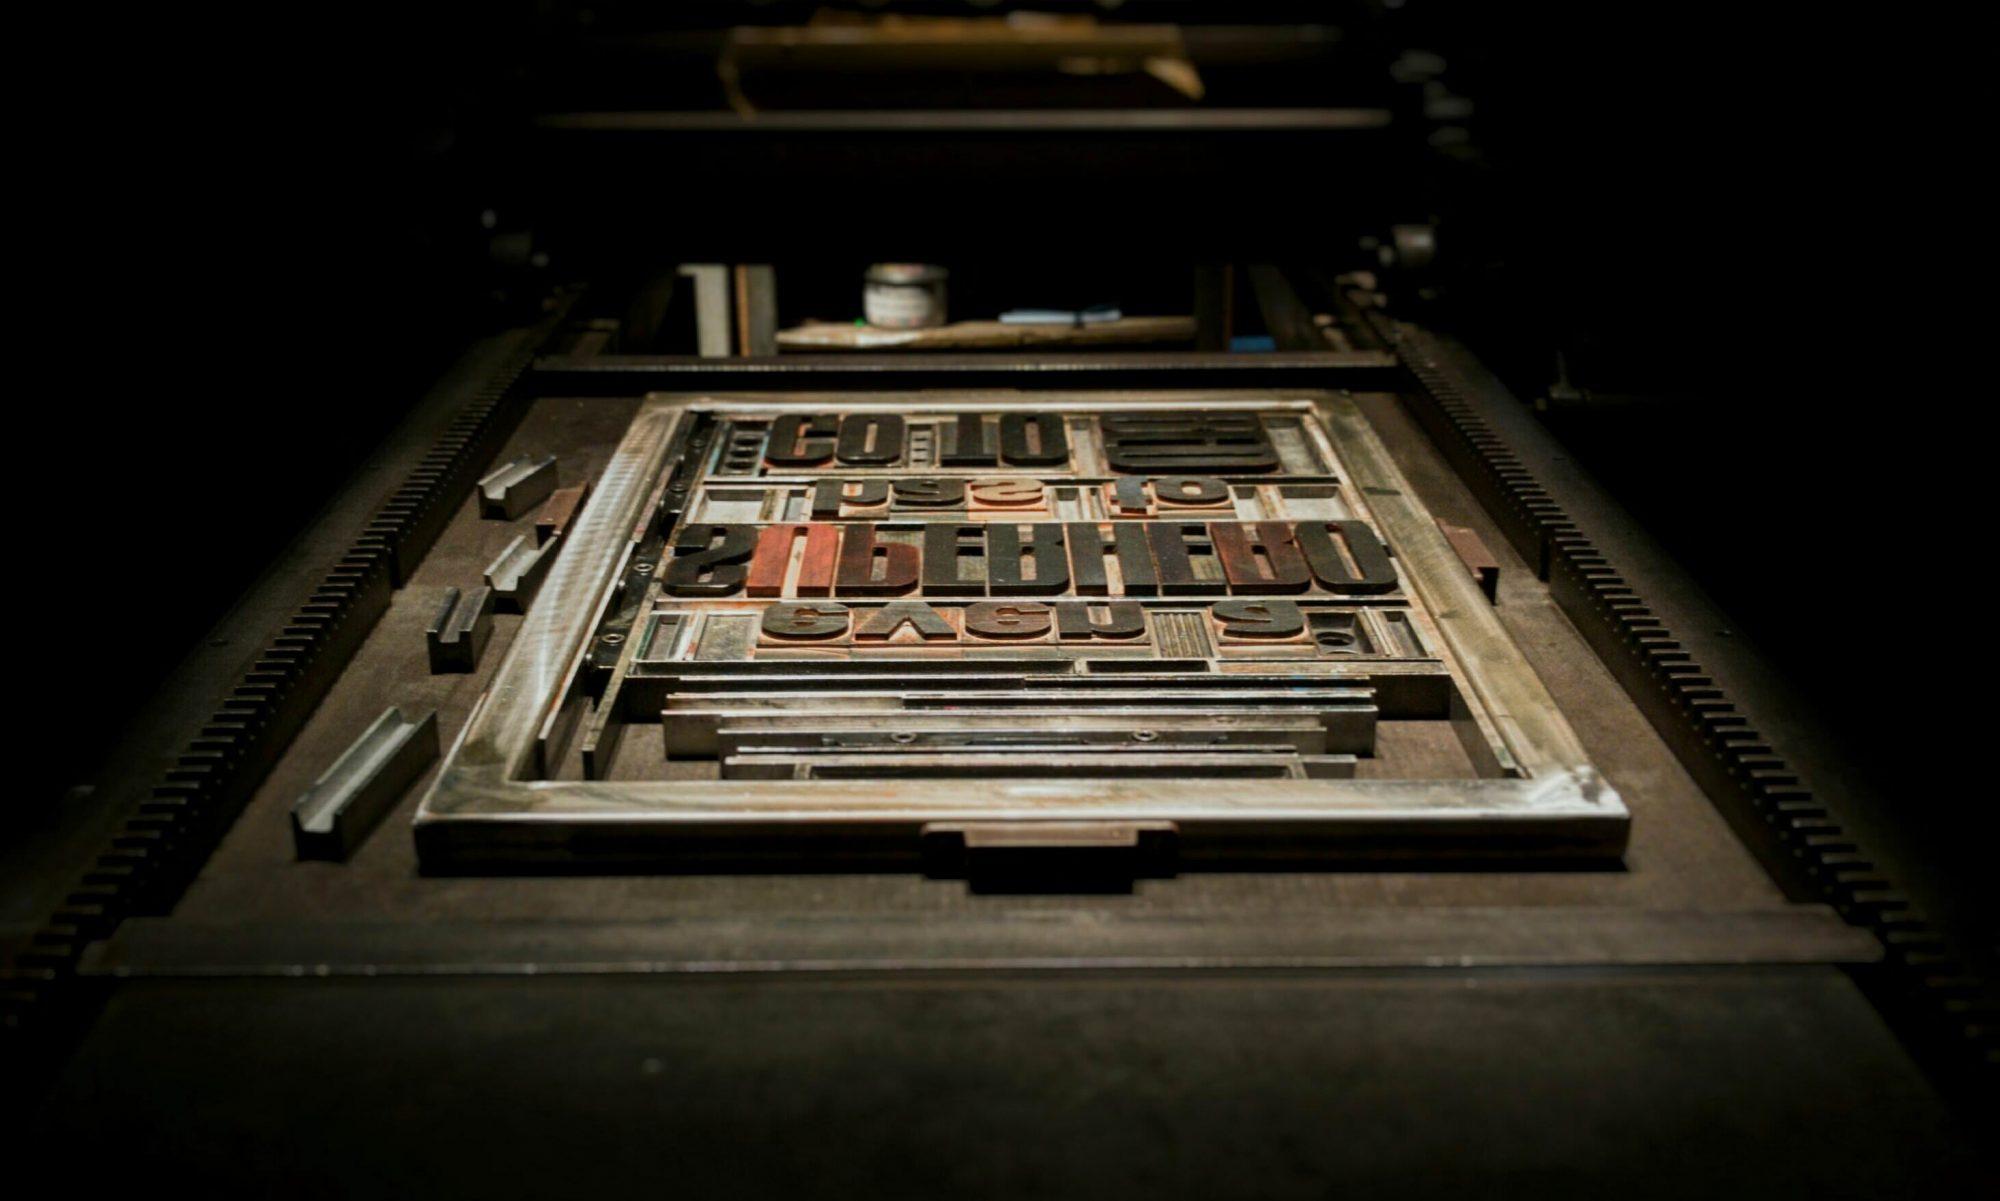 Packwood Printers Limited